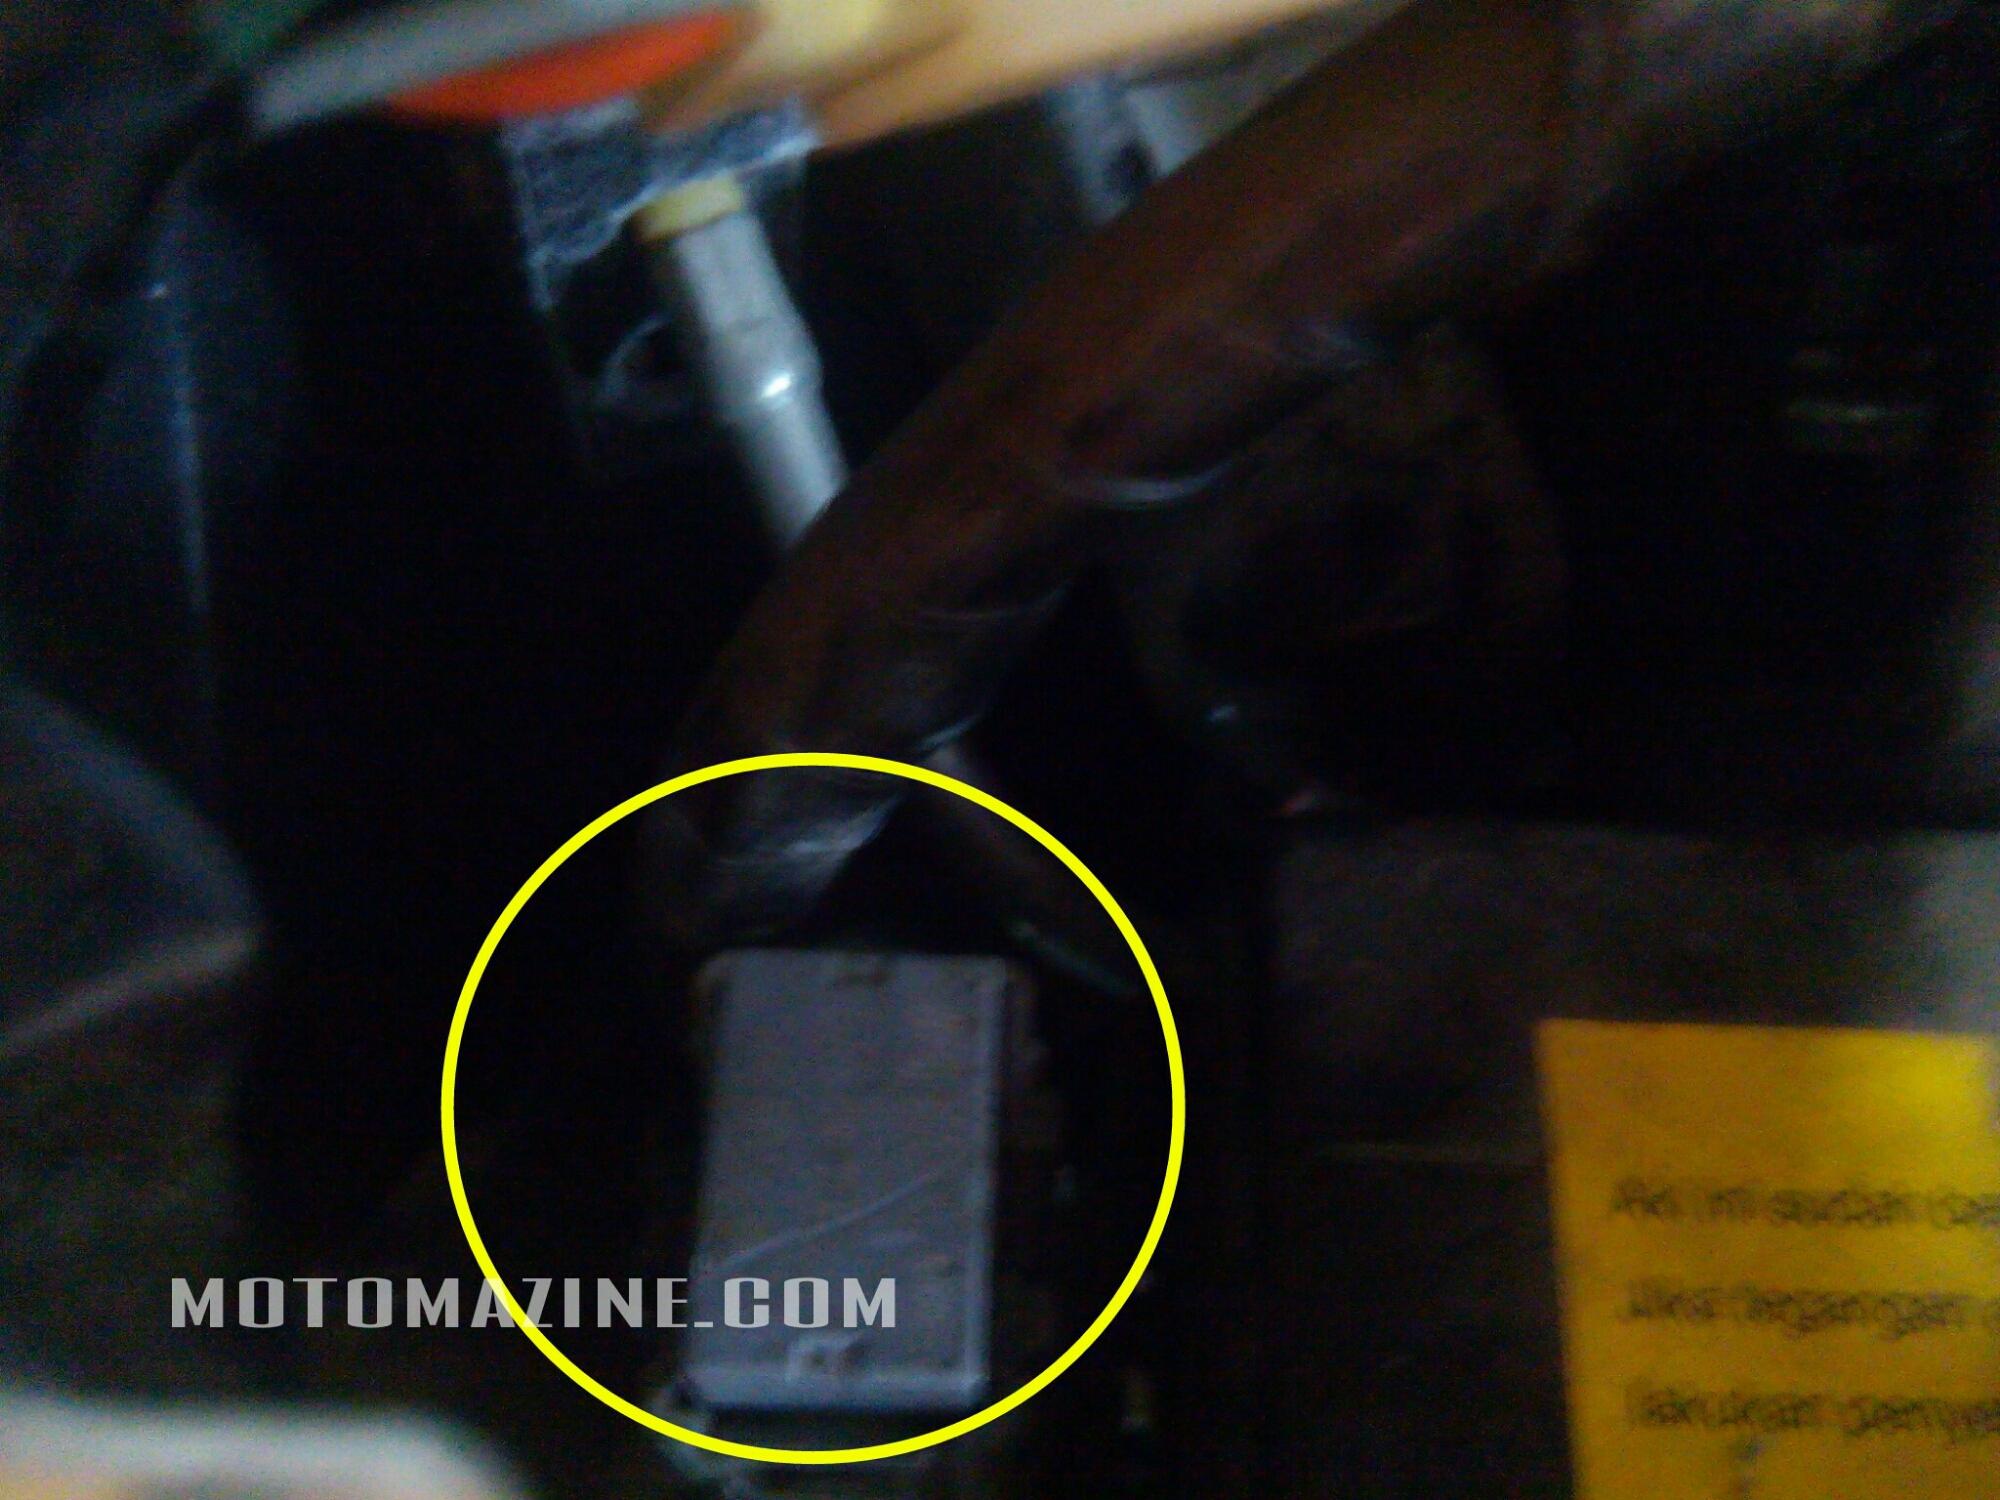 Modifikasi kelistrikan vario 125 lampak modifikasi honda vario 125 fi gagal on inilah penyebabnya motomazinecom asfbconference2016 Choice Image